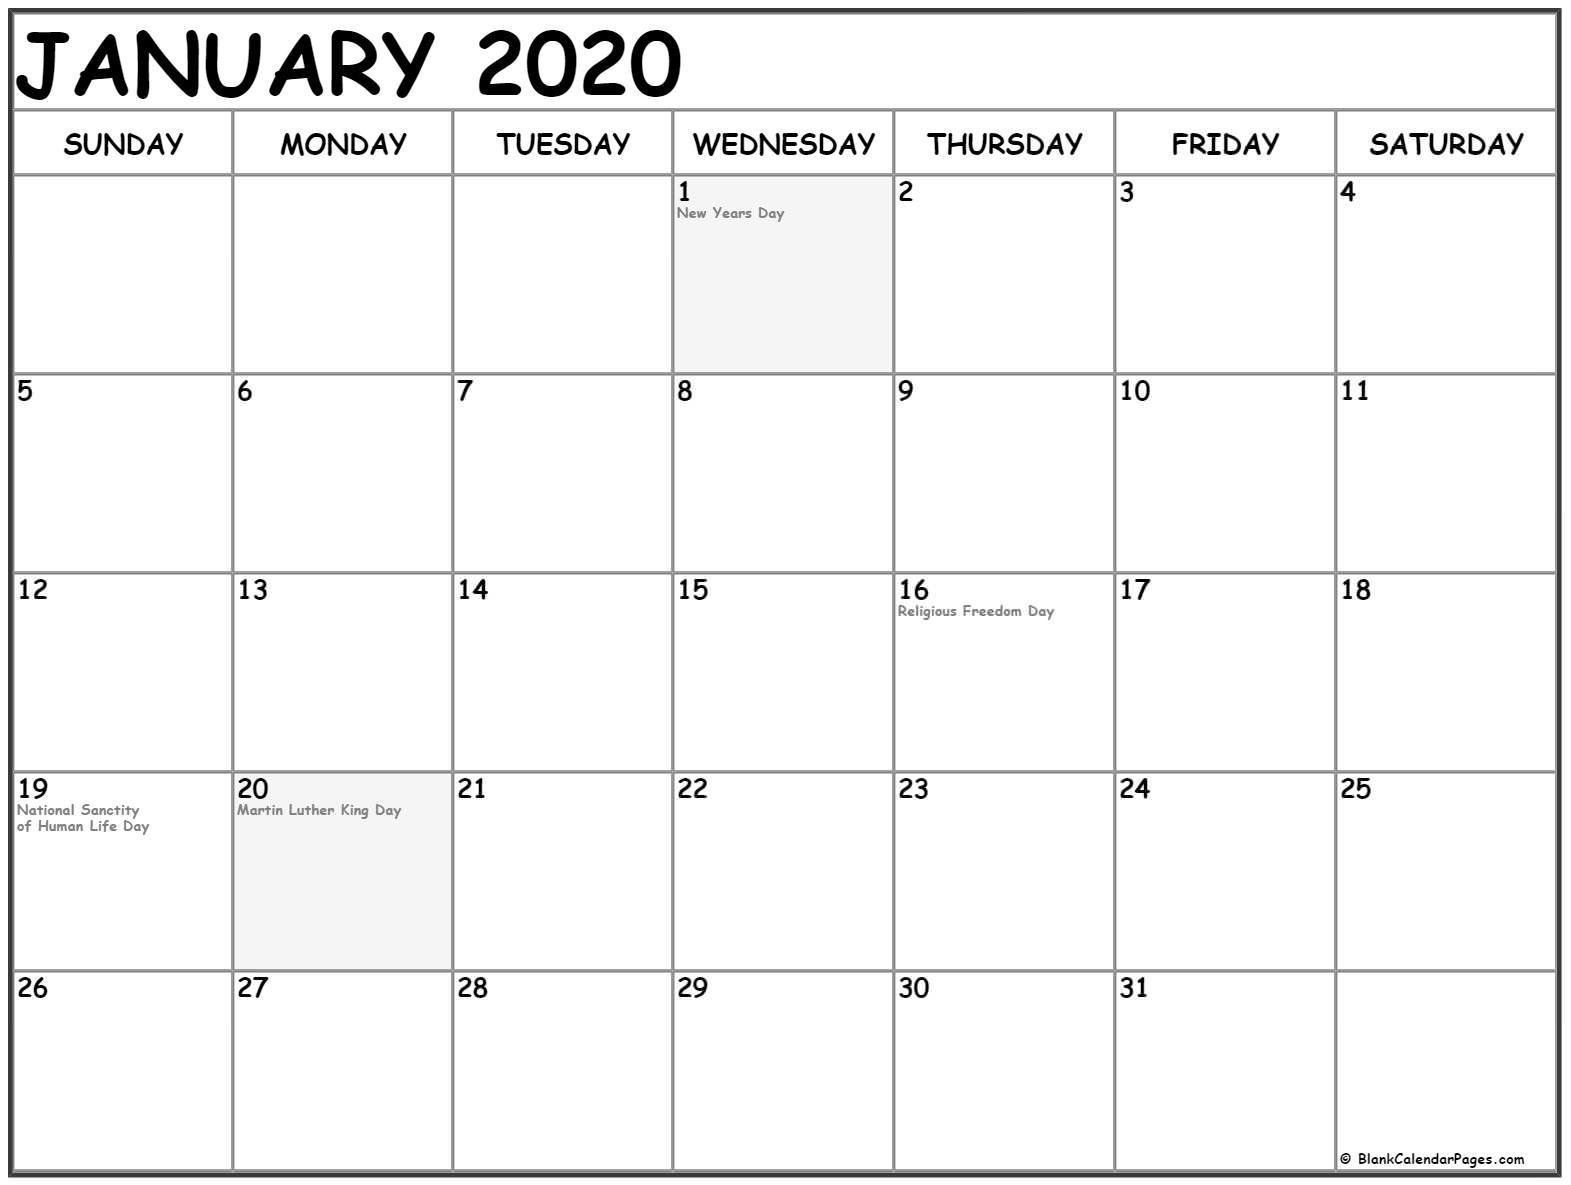 January 2020 Calendar Printable Templates Holidays - July-January 2020 Calendar Holidays